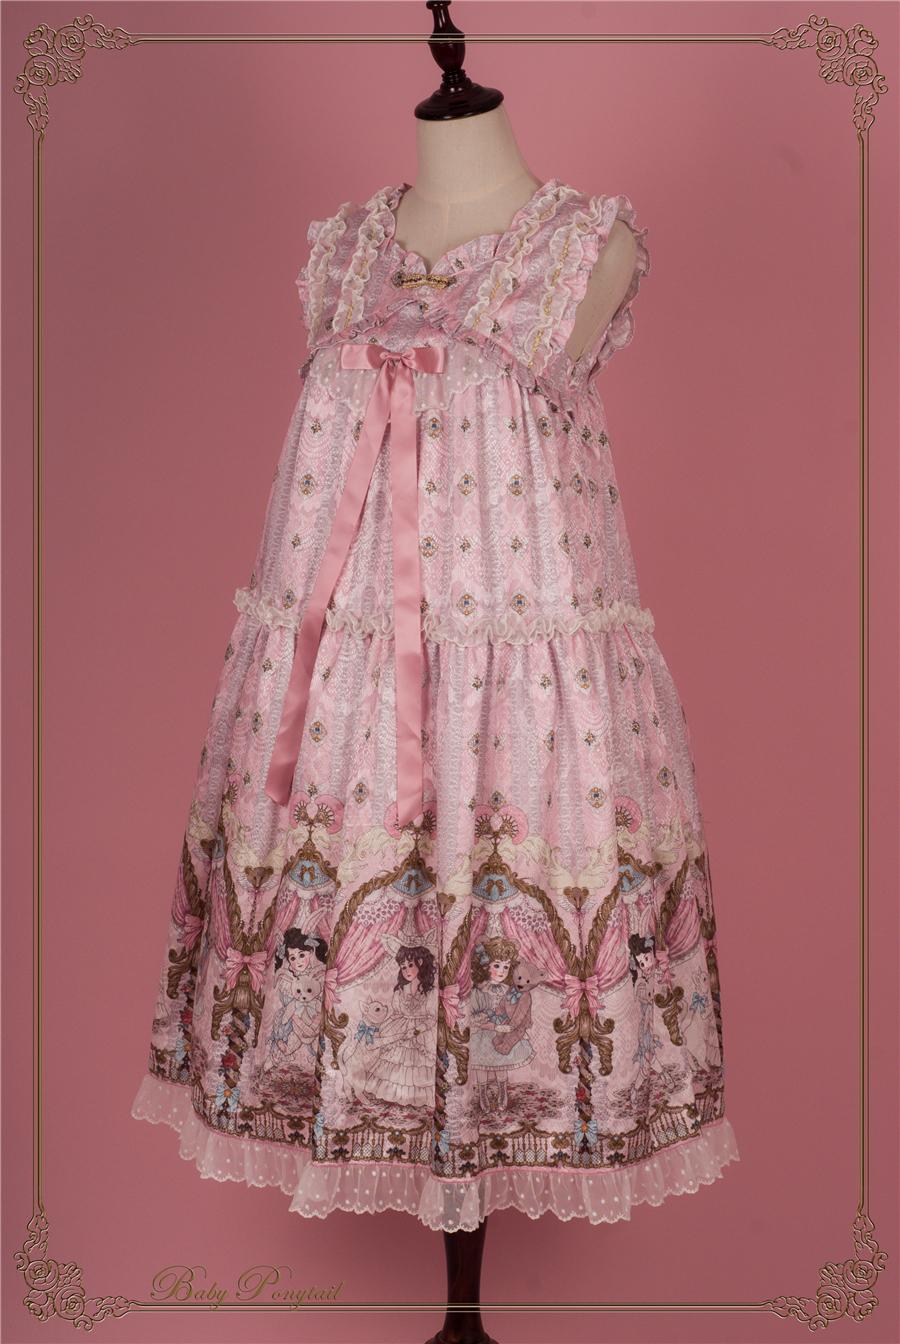 BabyPonytail_Stock Photo_My Favorite Companion_JSK Baby Doll Pink_04.jpg